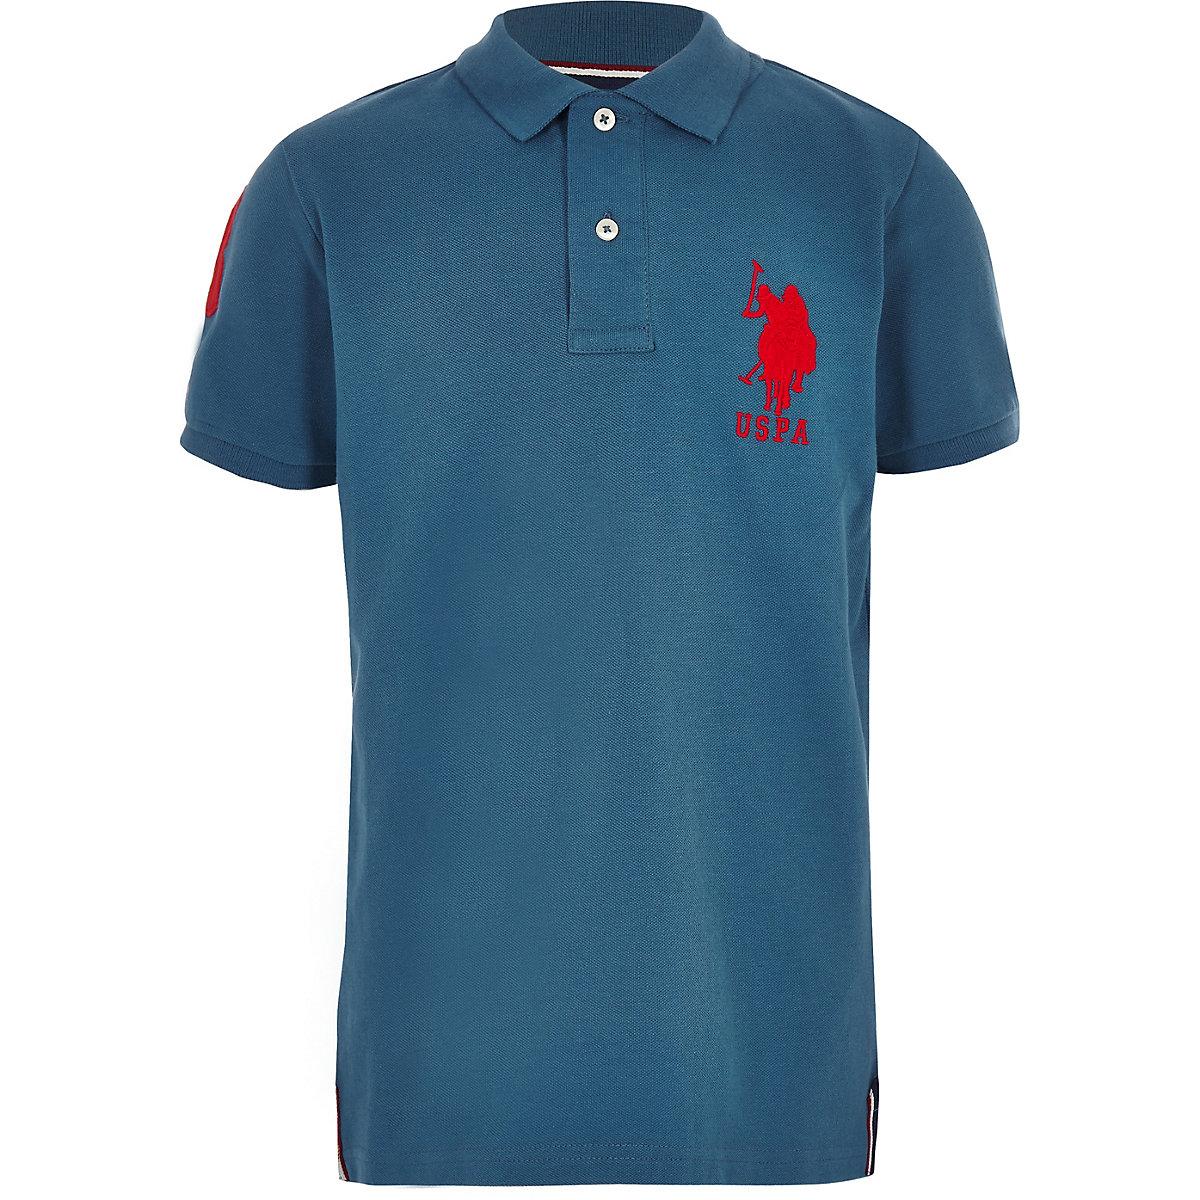 Boys blue U.S. Polo Assn polo shirt